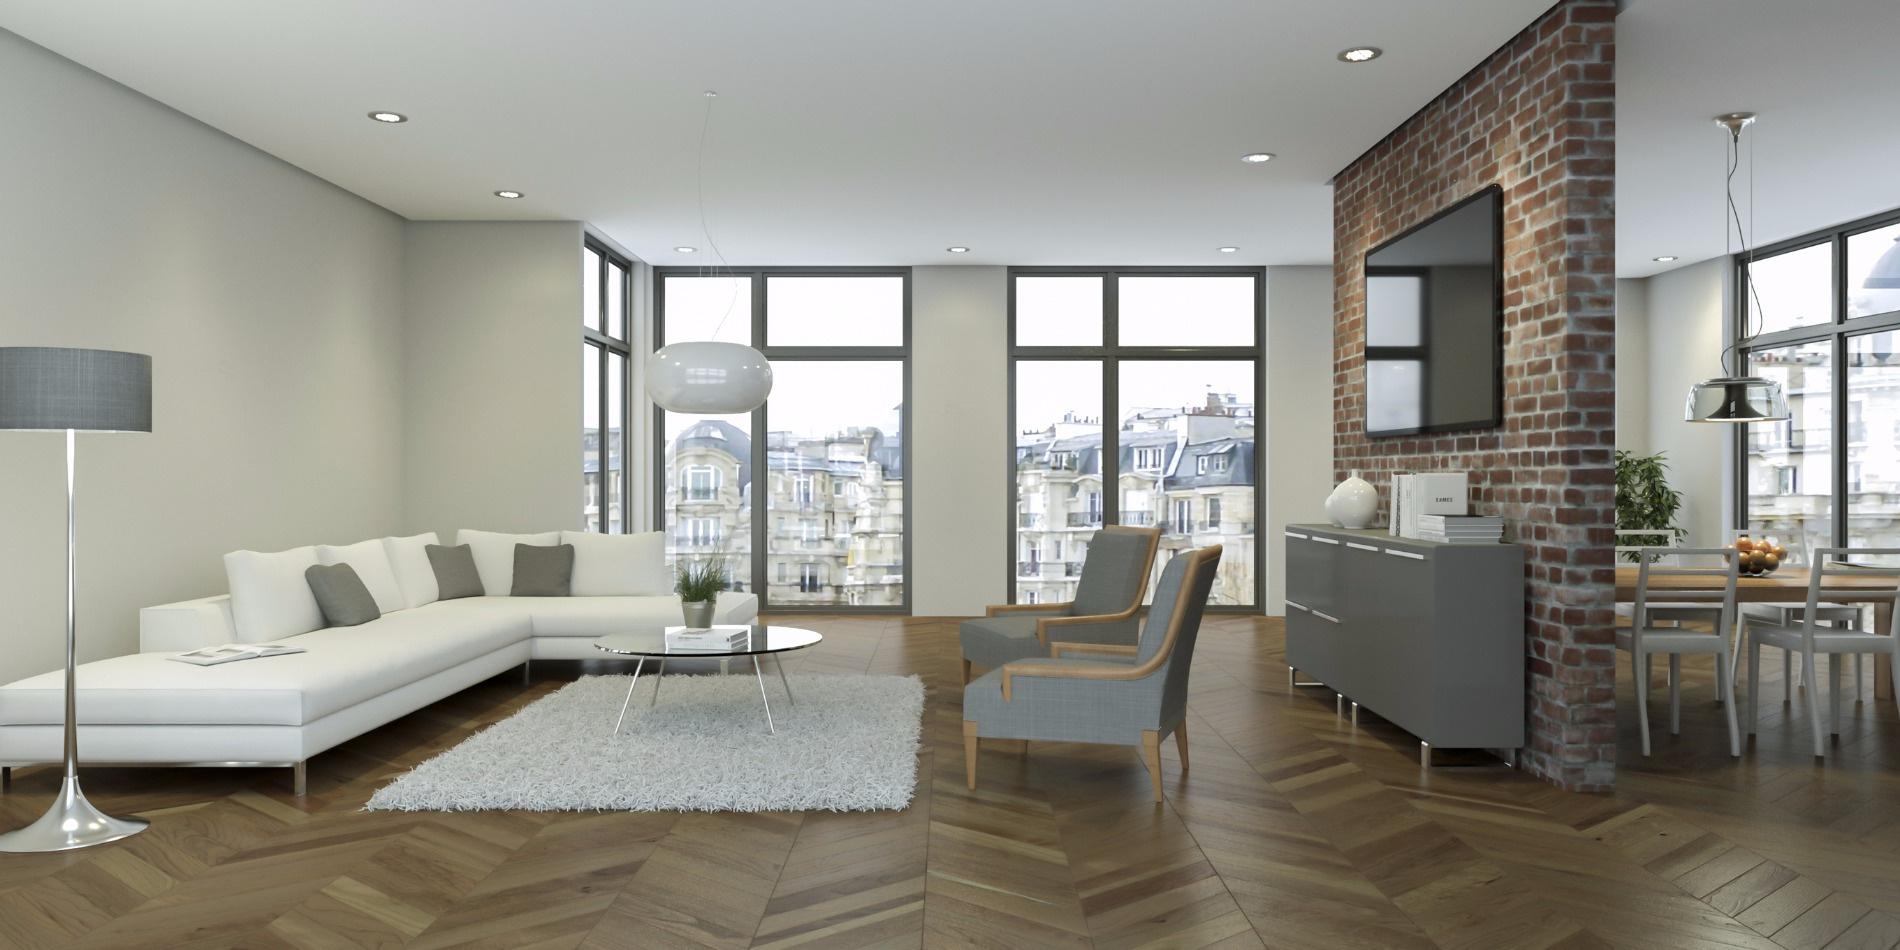 Annonce vente appartement corenc 38700 62 m 258 000 for Annonce vente appartement